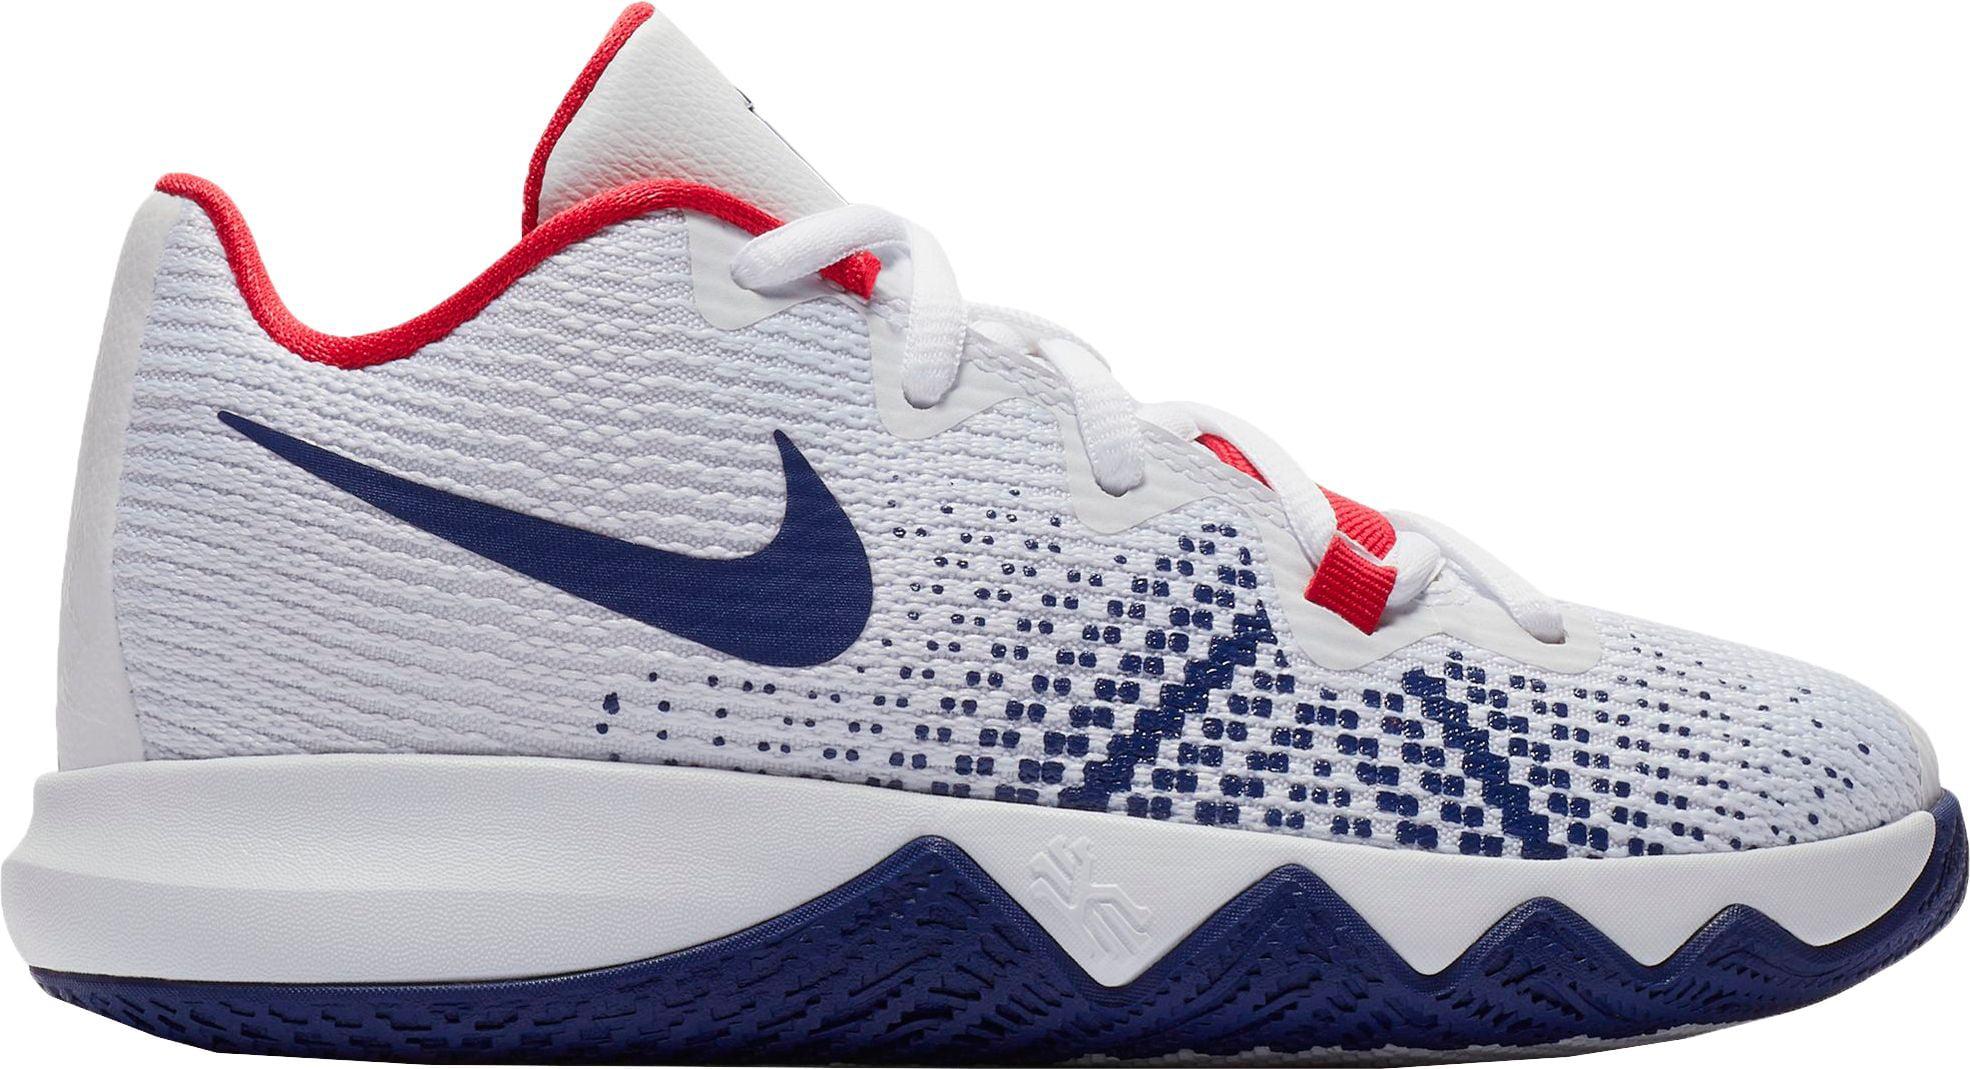 aff8b848f72f ... discount code for nike kids preschool kyrie flytrap basketball shoes  42dc4 4983d